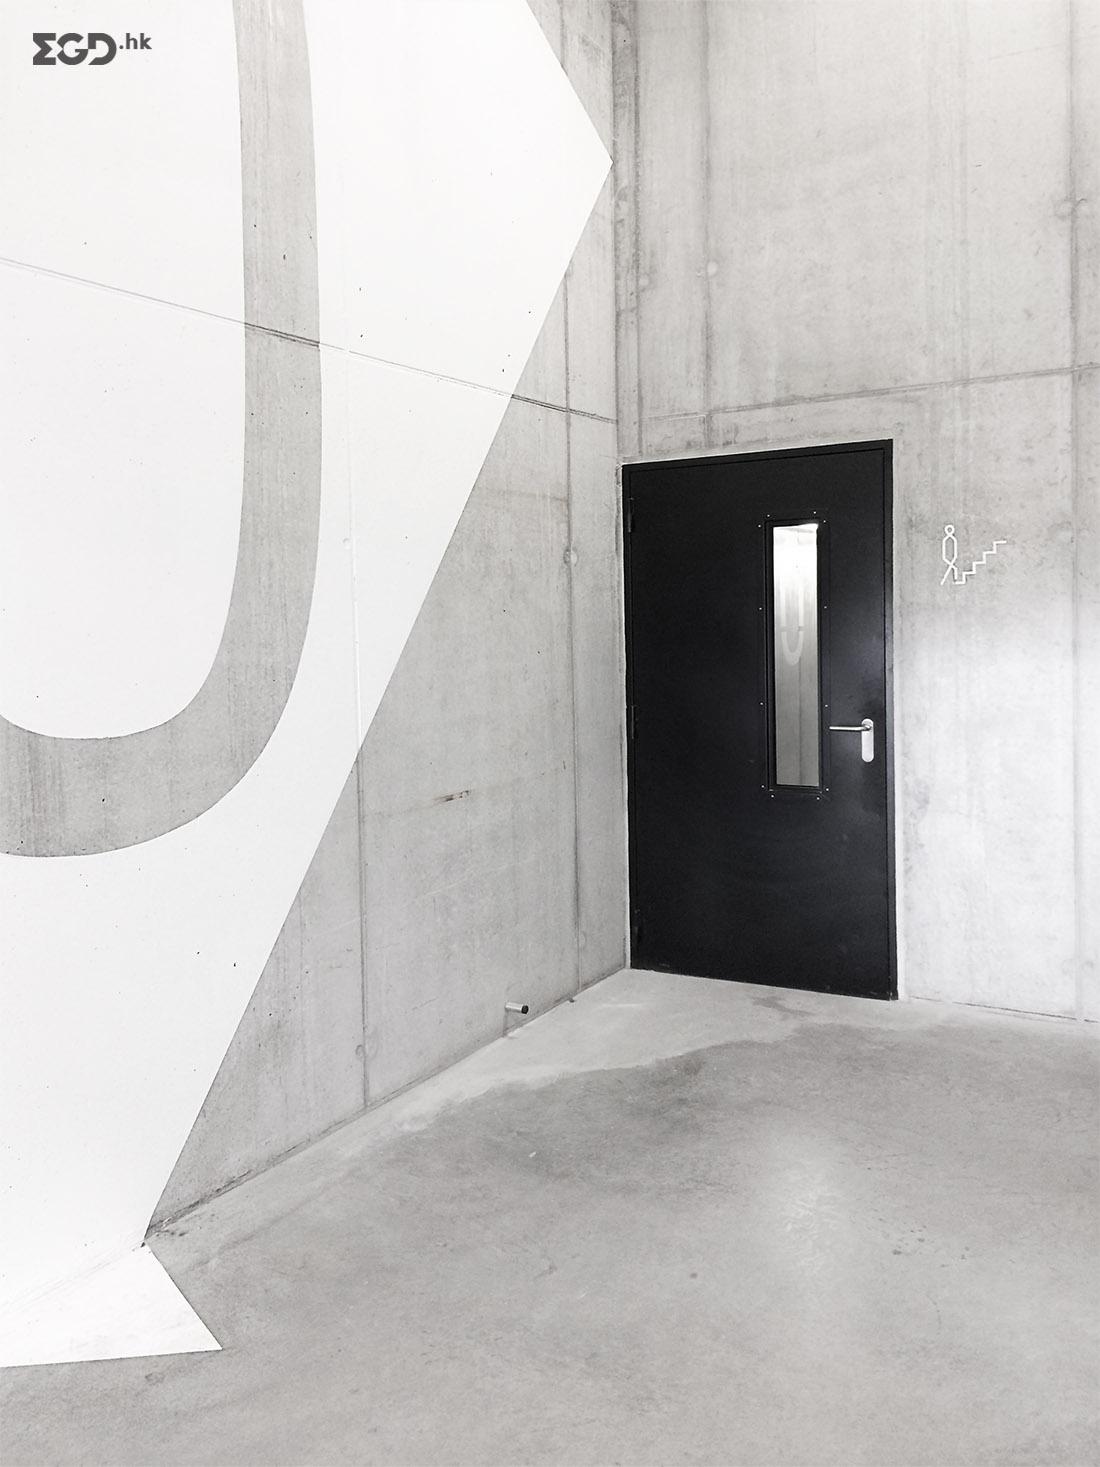 St. Lucas医院停车塔导视设计 © RikGrafiek